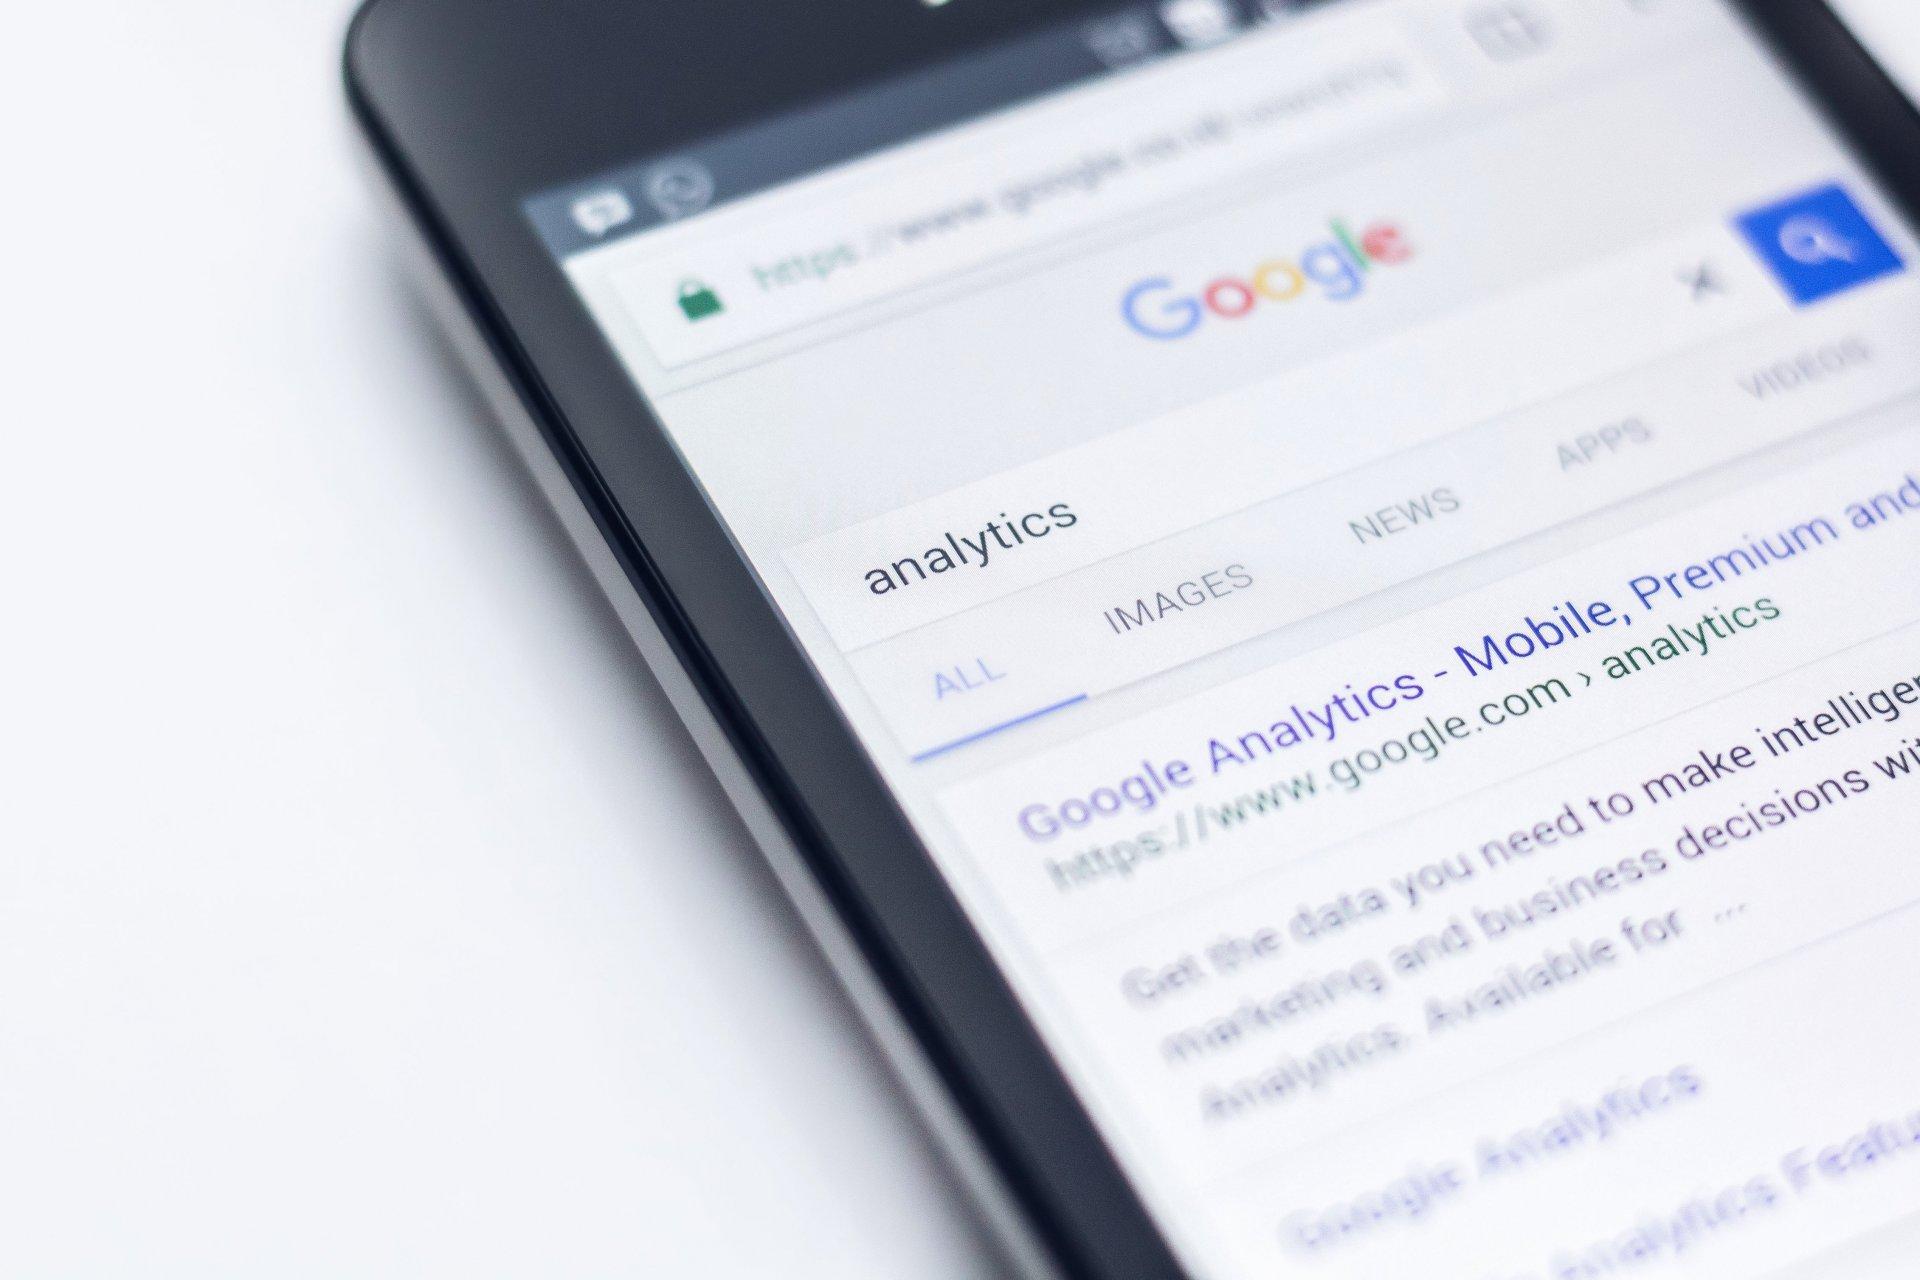 Department of Labor Files Suit Against Google